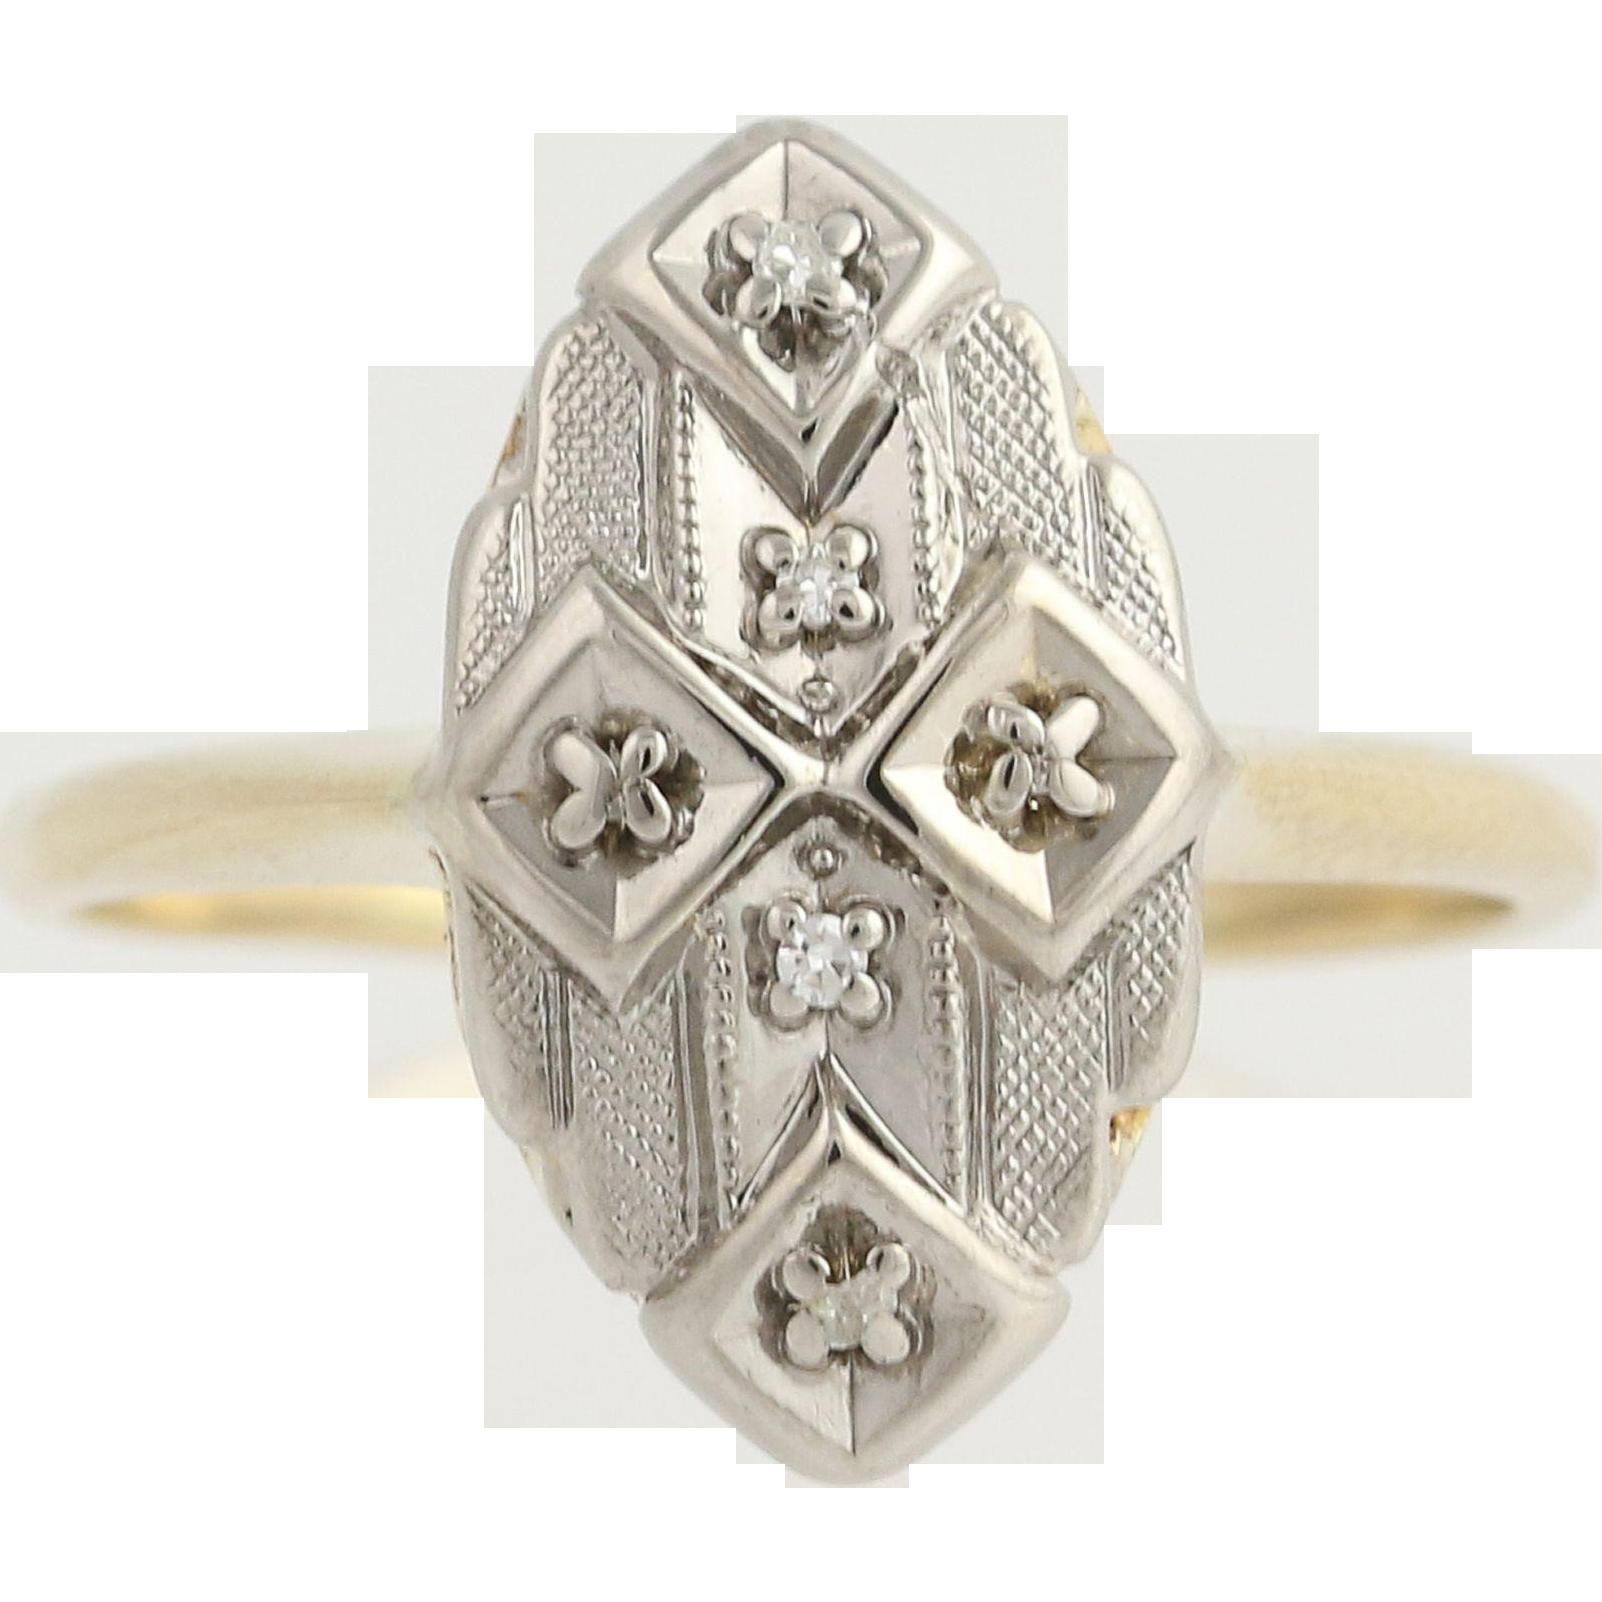 Vintage Diamond-Accented Ring - 14k Yellow & White Gold Women's .03ctw